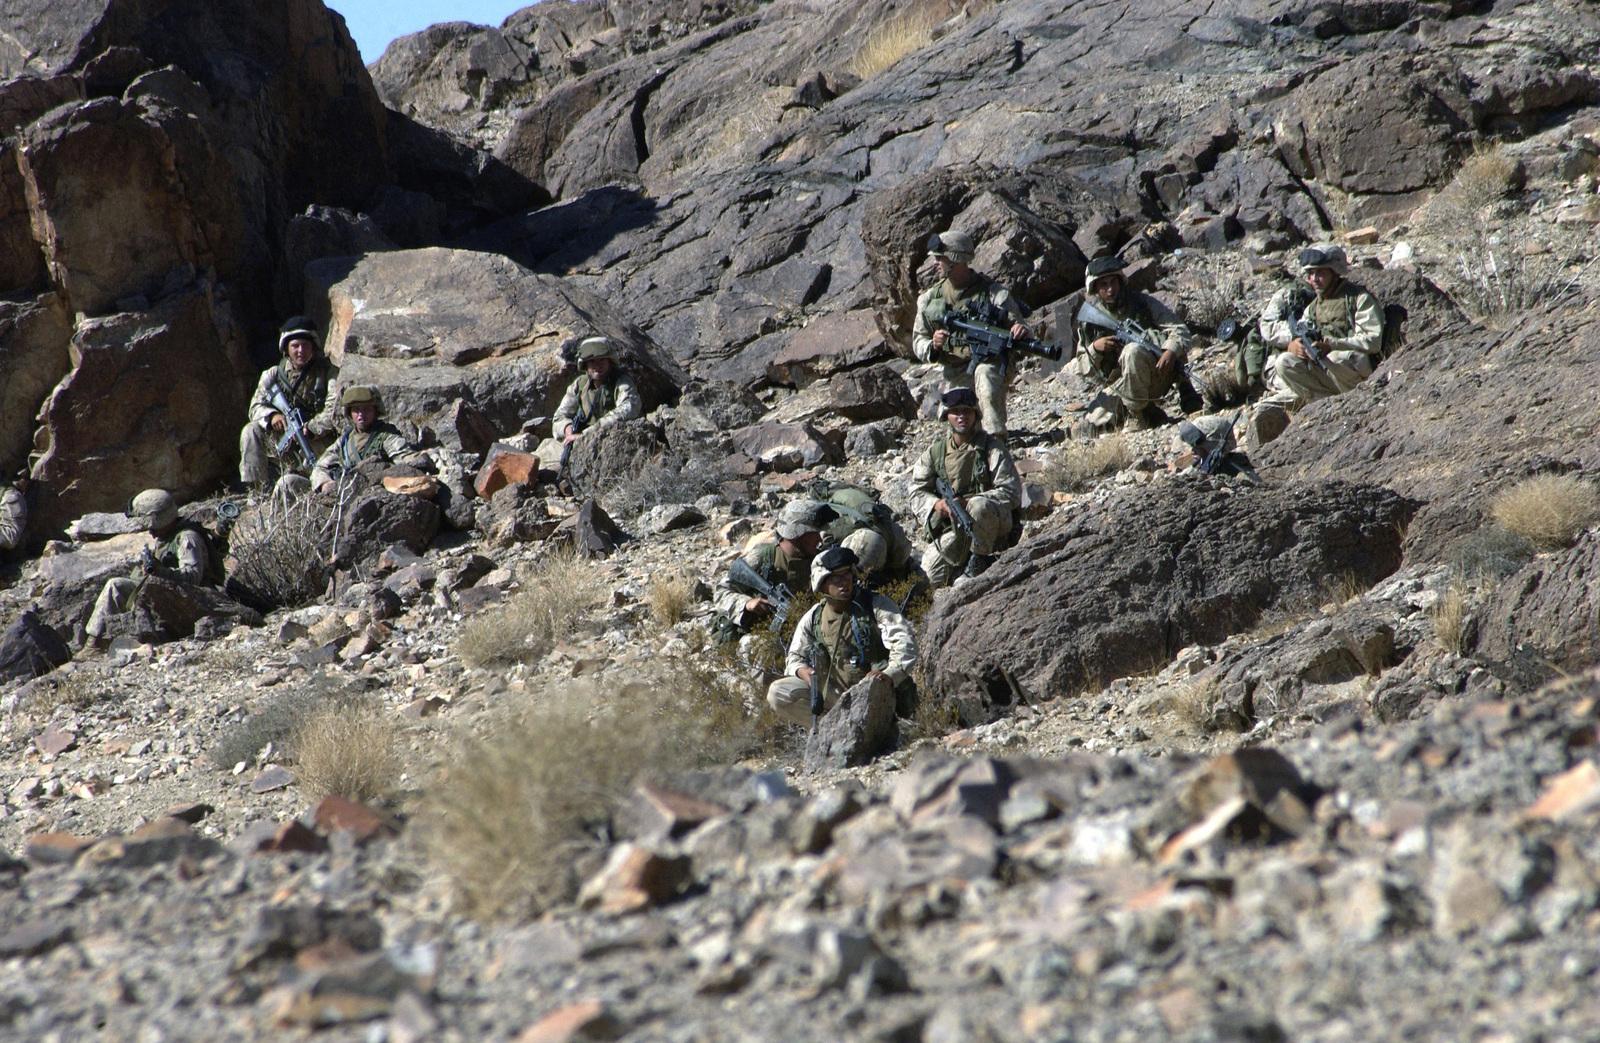 US Marine Corps (USMC) Marines from the First Platoon (Plt), Lima Company, 3rd Battalion, 4th Marines, take Machine Gun Hill at Range 400 at Marine Air Ground Task Force Training Command (MAGTFTC), Twentynine Palms, California (CA)